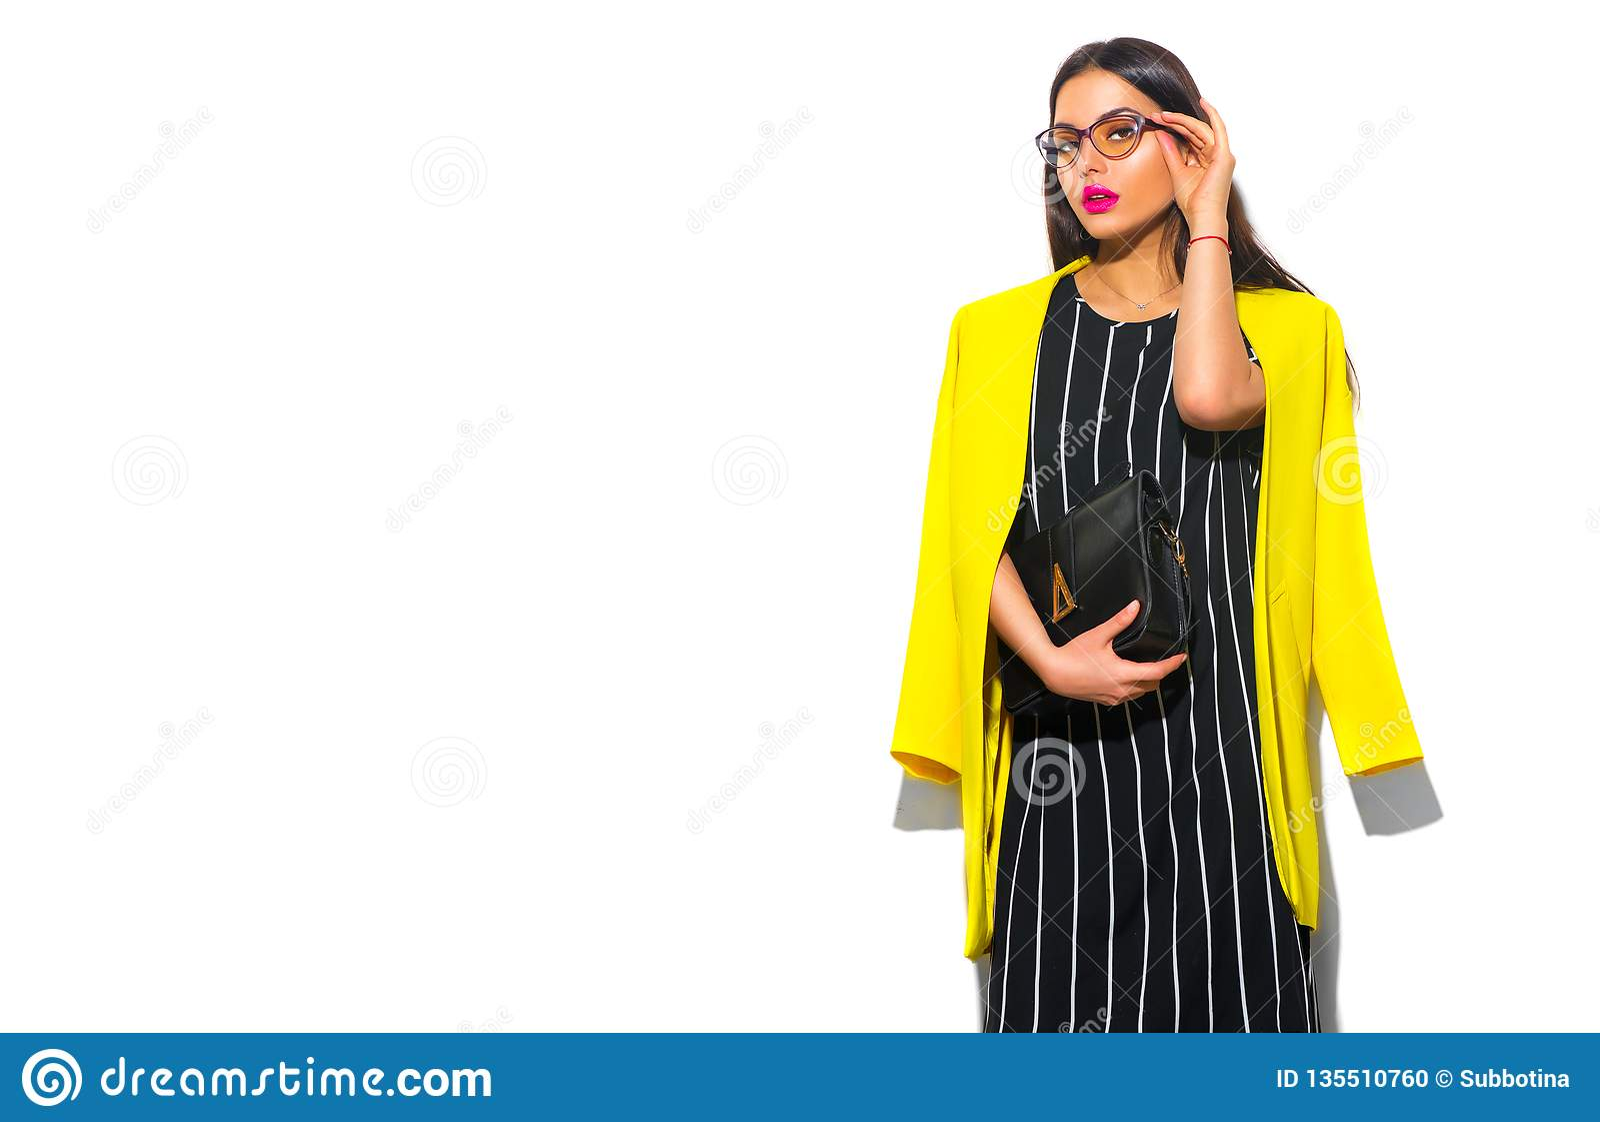 Business wear look style. Beauty fashion model girl in trendy yellow blazer wearing glasses, on white background